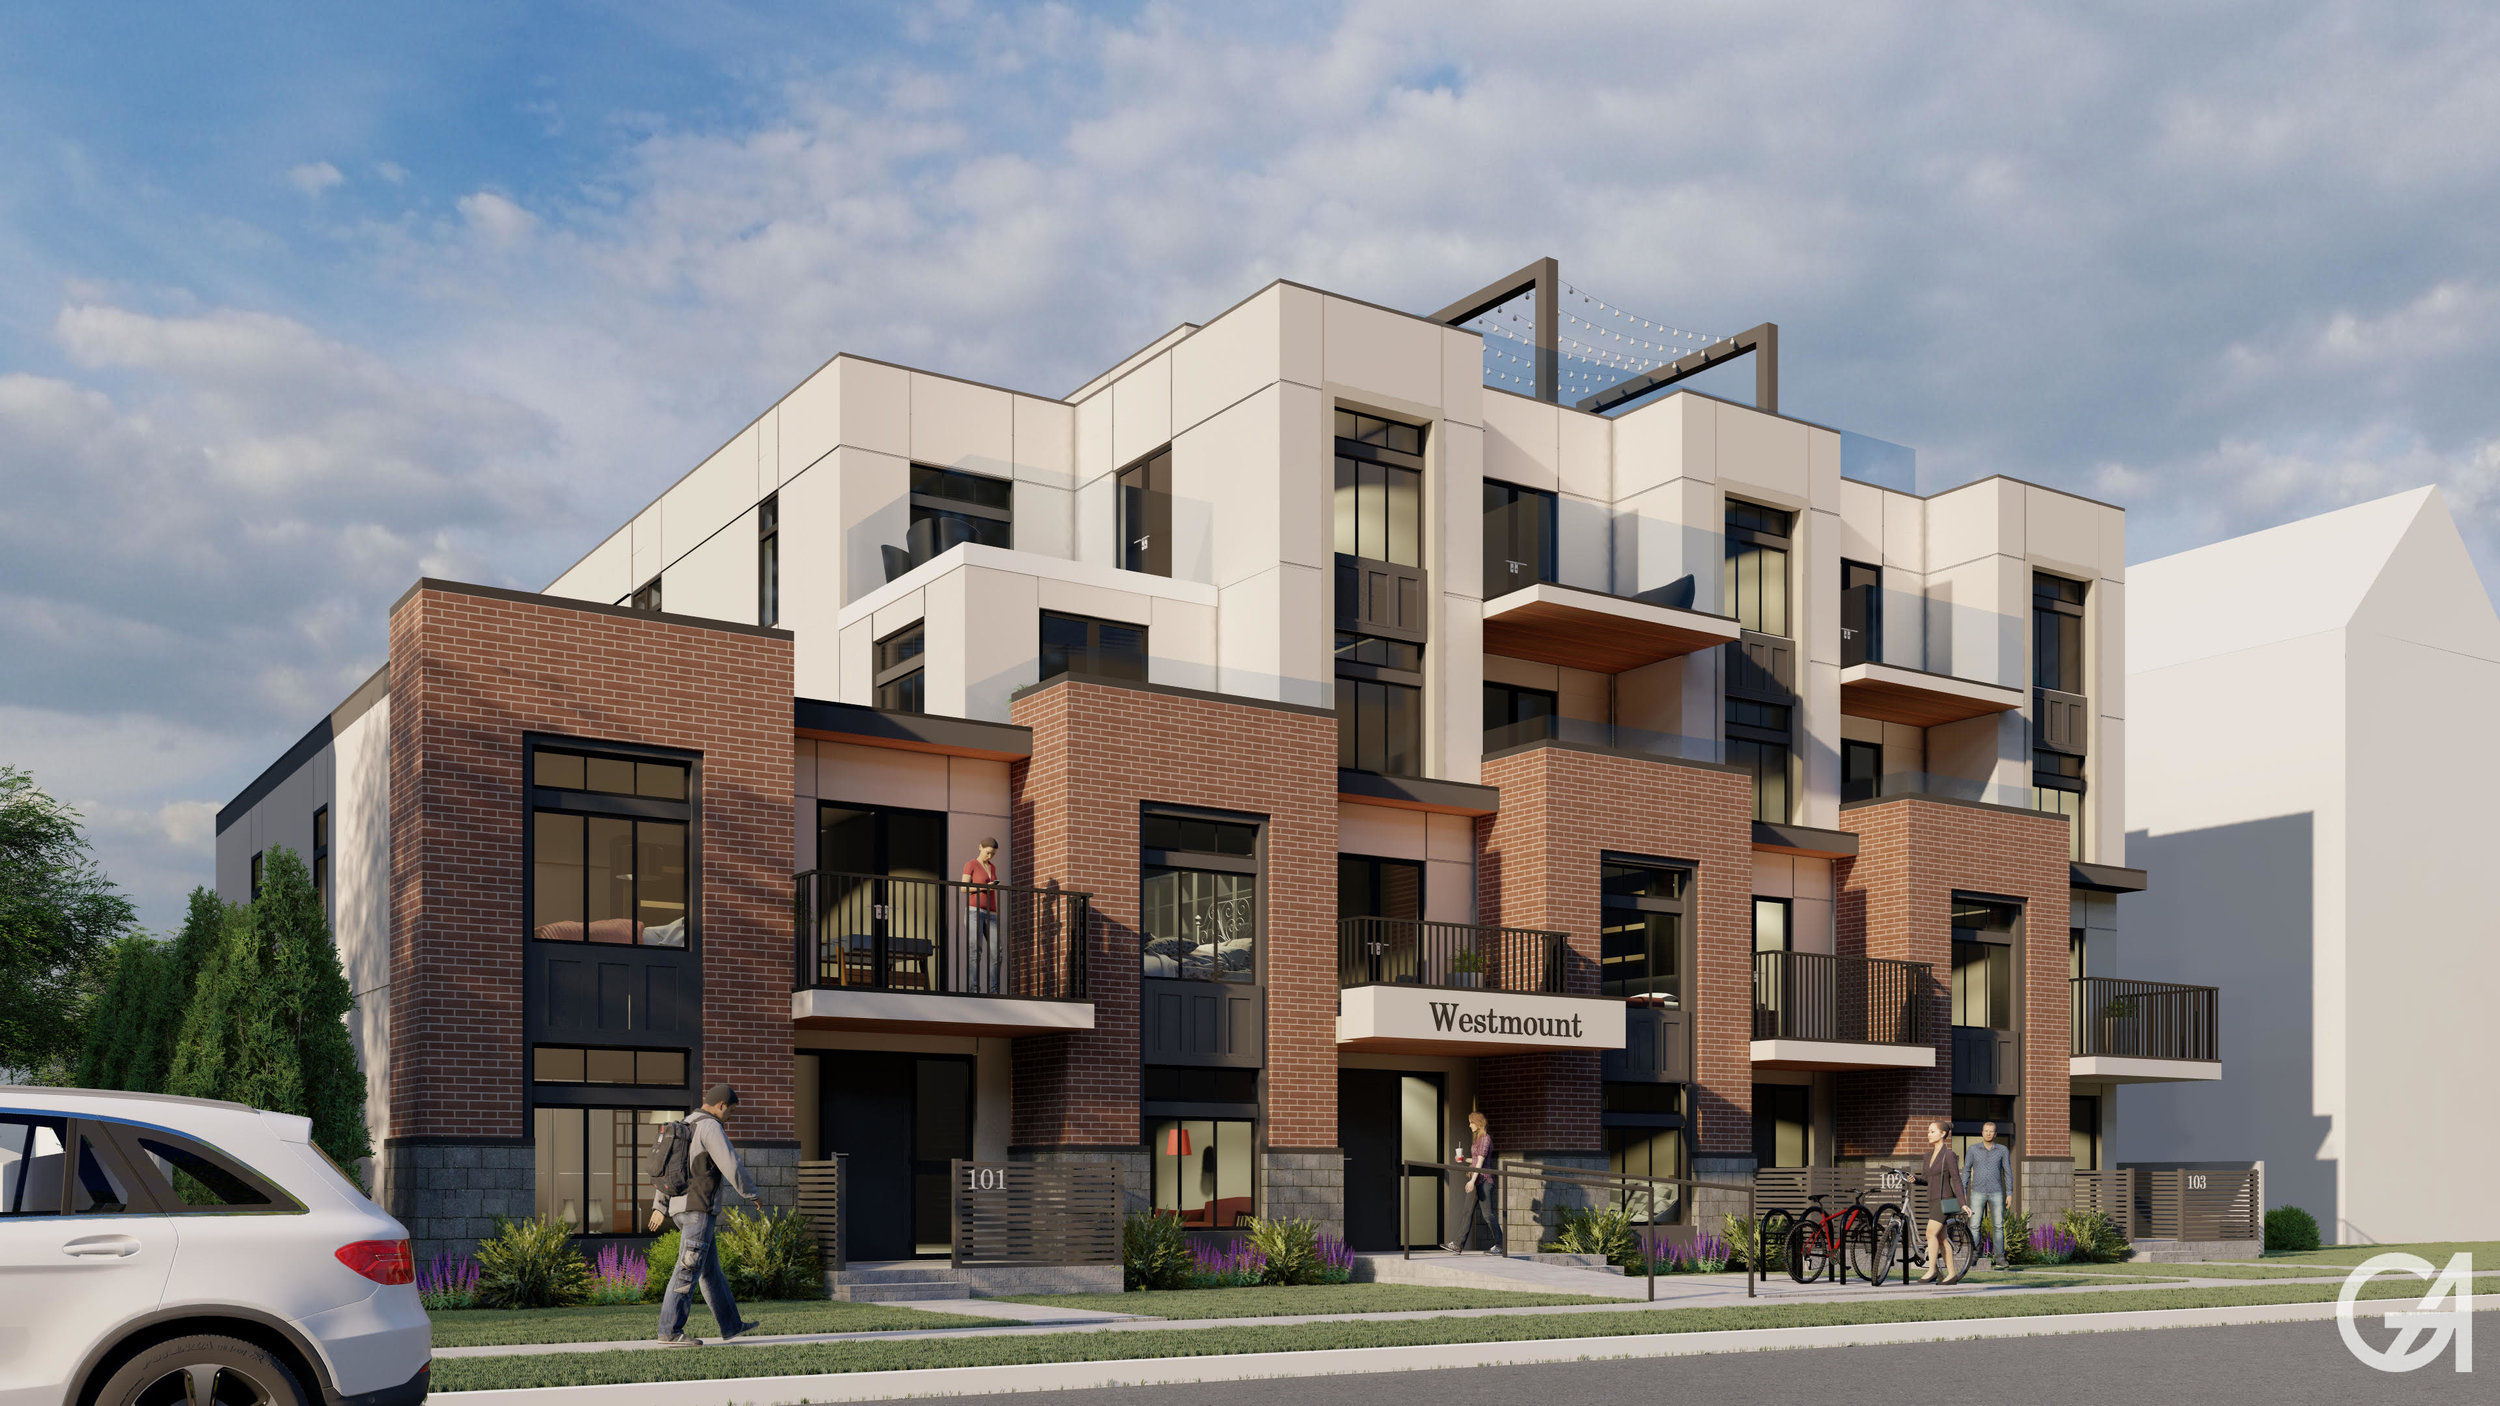 westmount-122-apartments-2.jpg